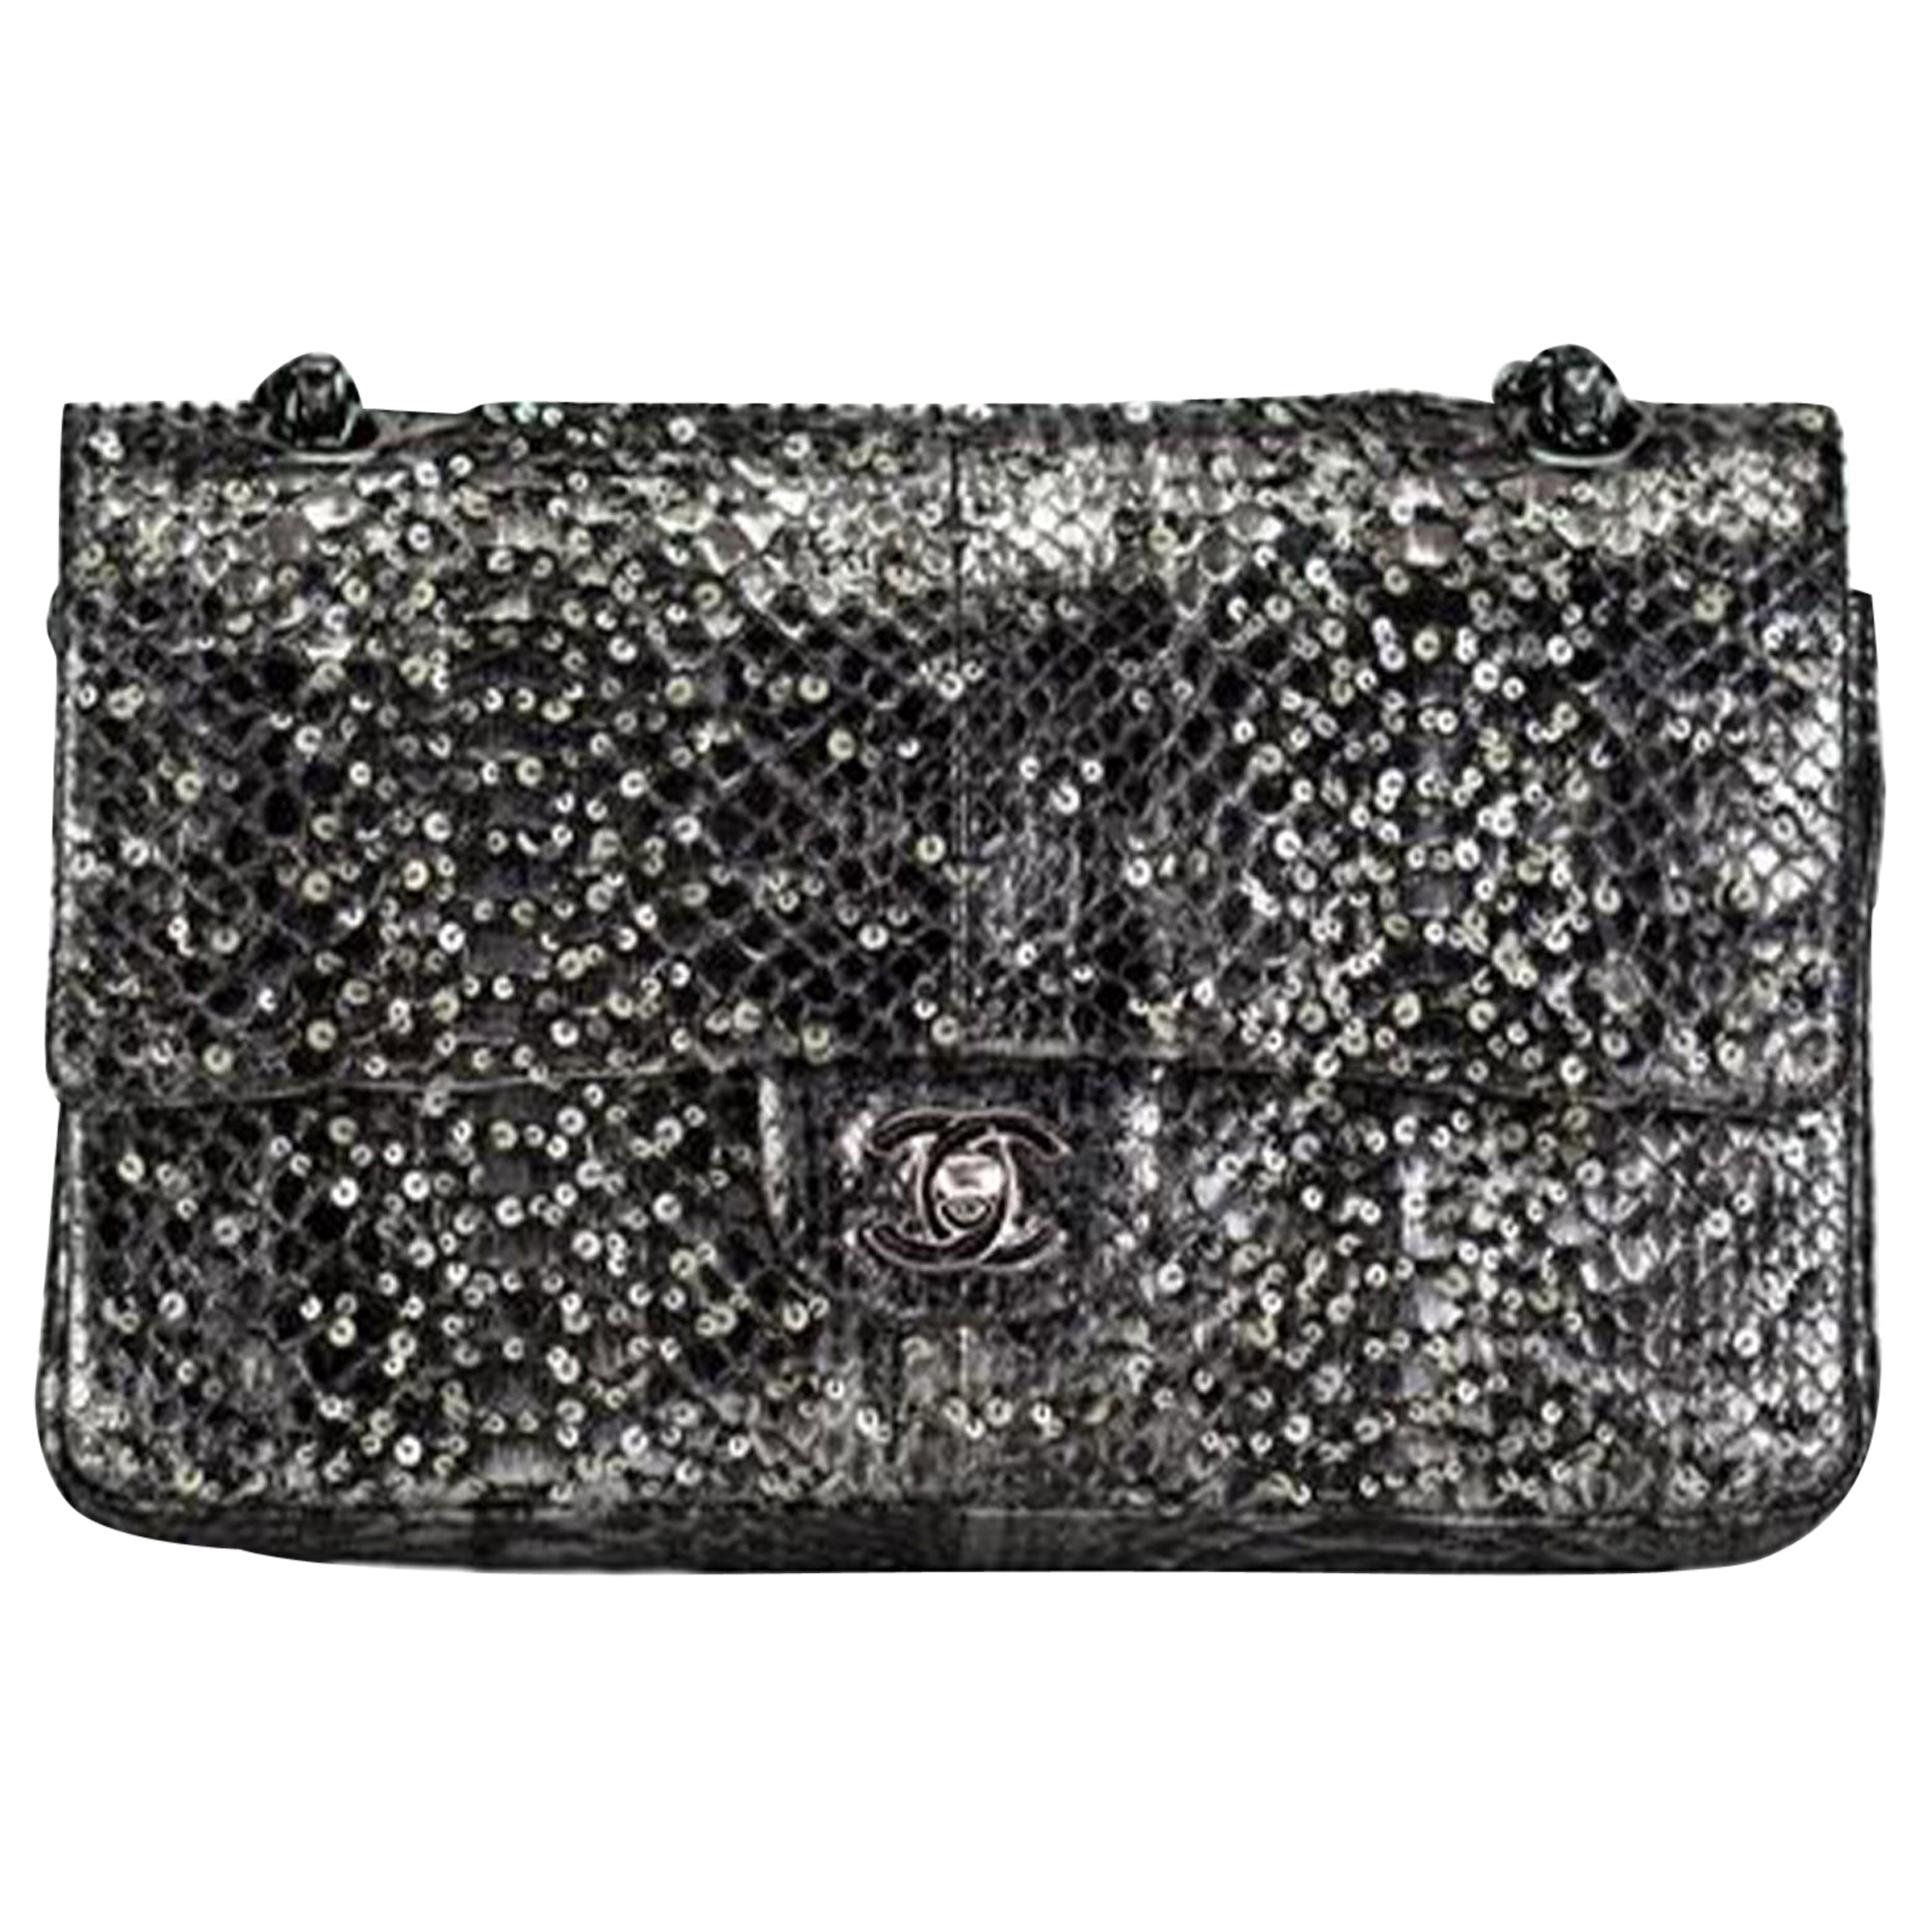 Chanel Classic Flap Exotic Limited Edition Metallic Grey Python Shoulder Bag